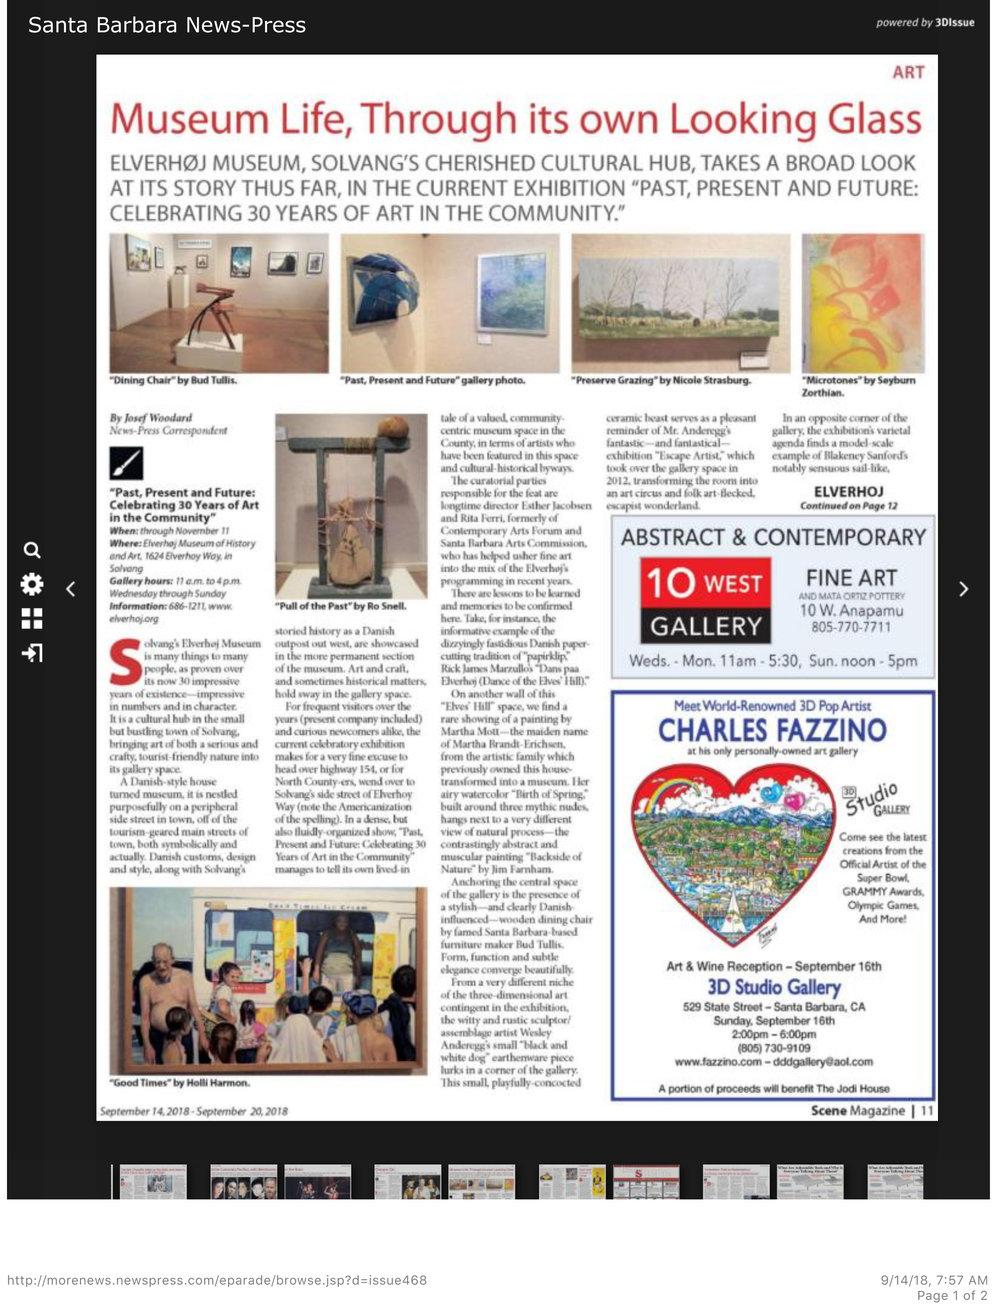 Santa Barbara New-Press - Scene Mag  Present Future Elverhoj-1.jpg